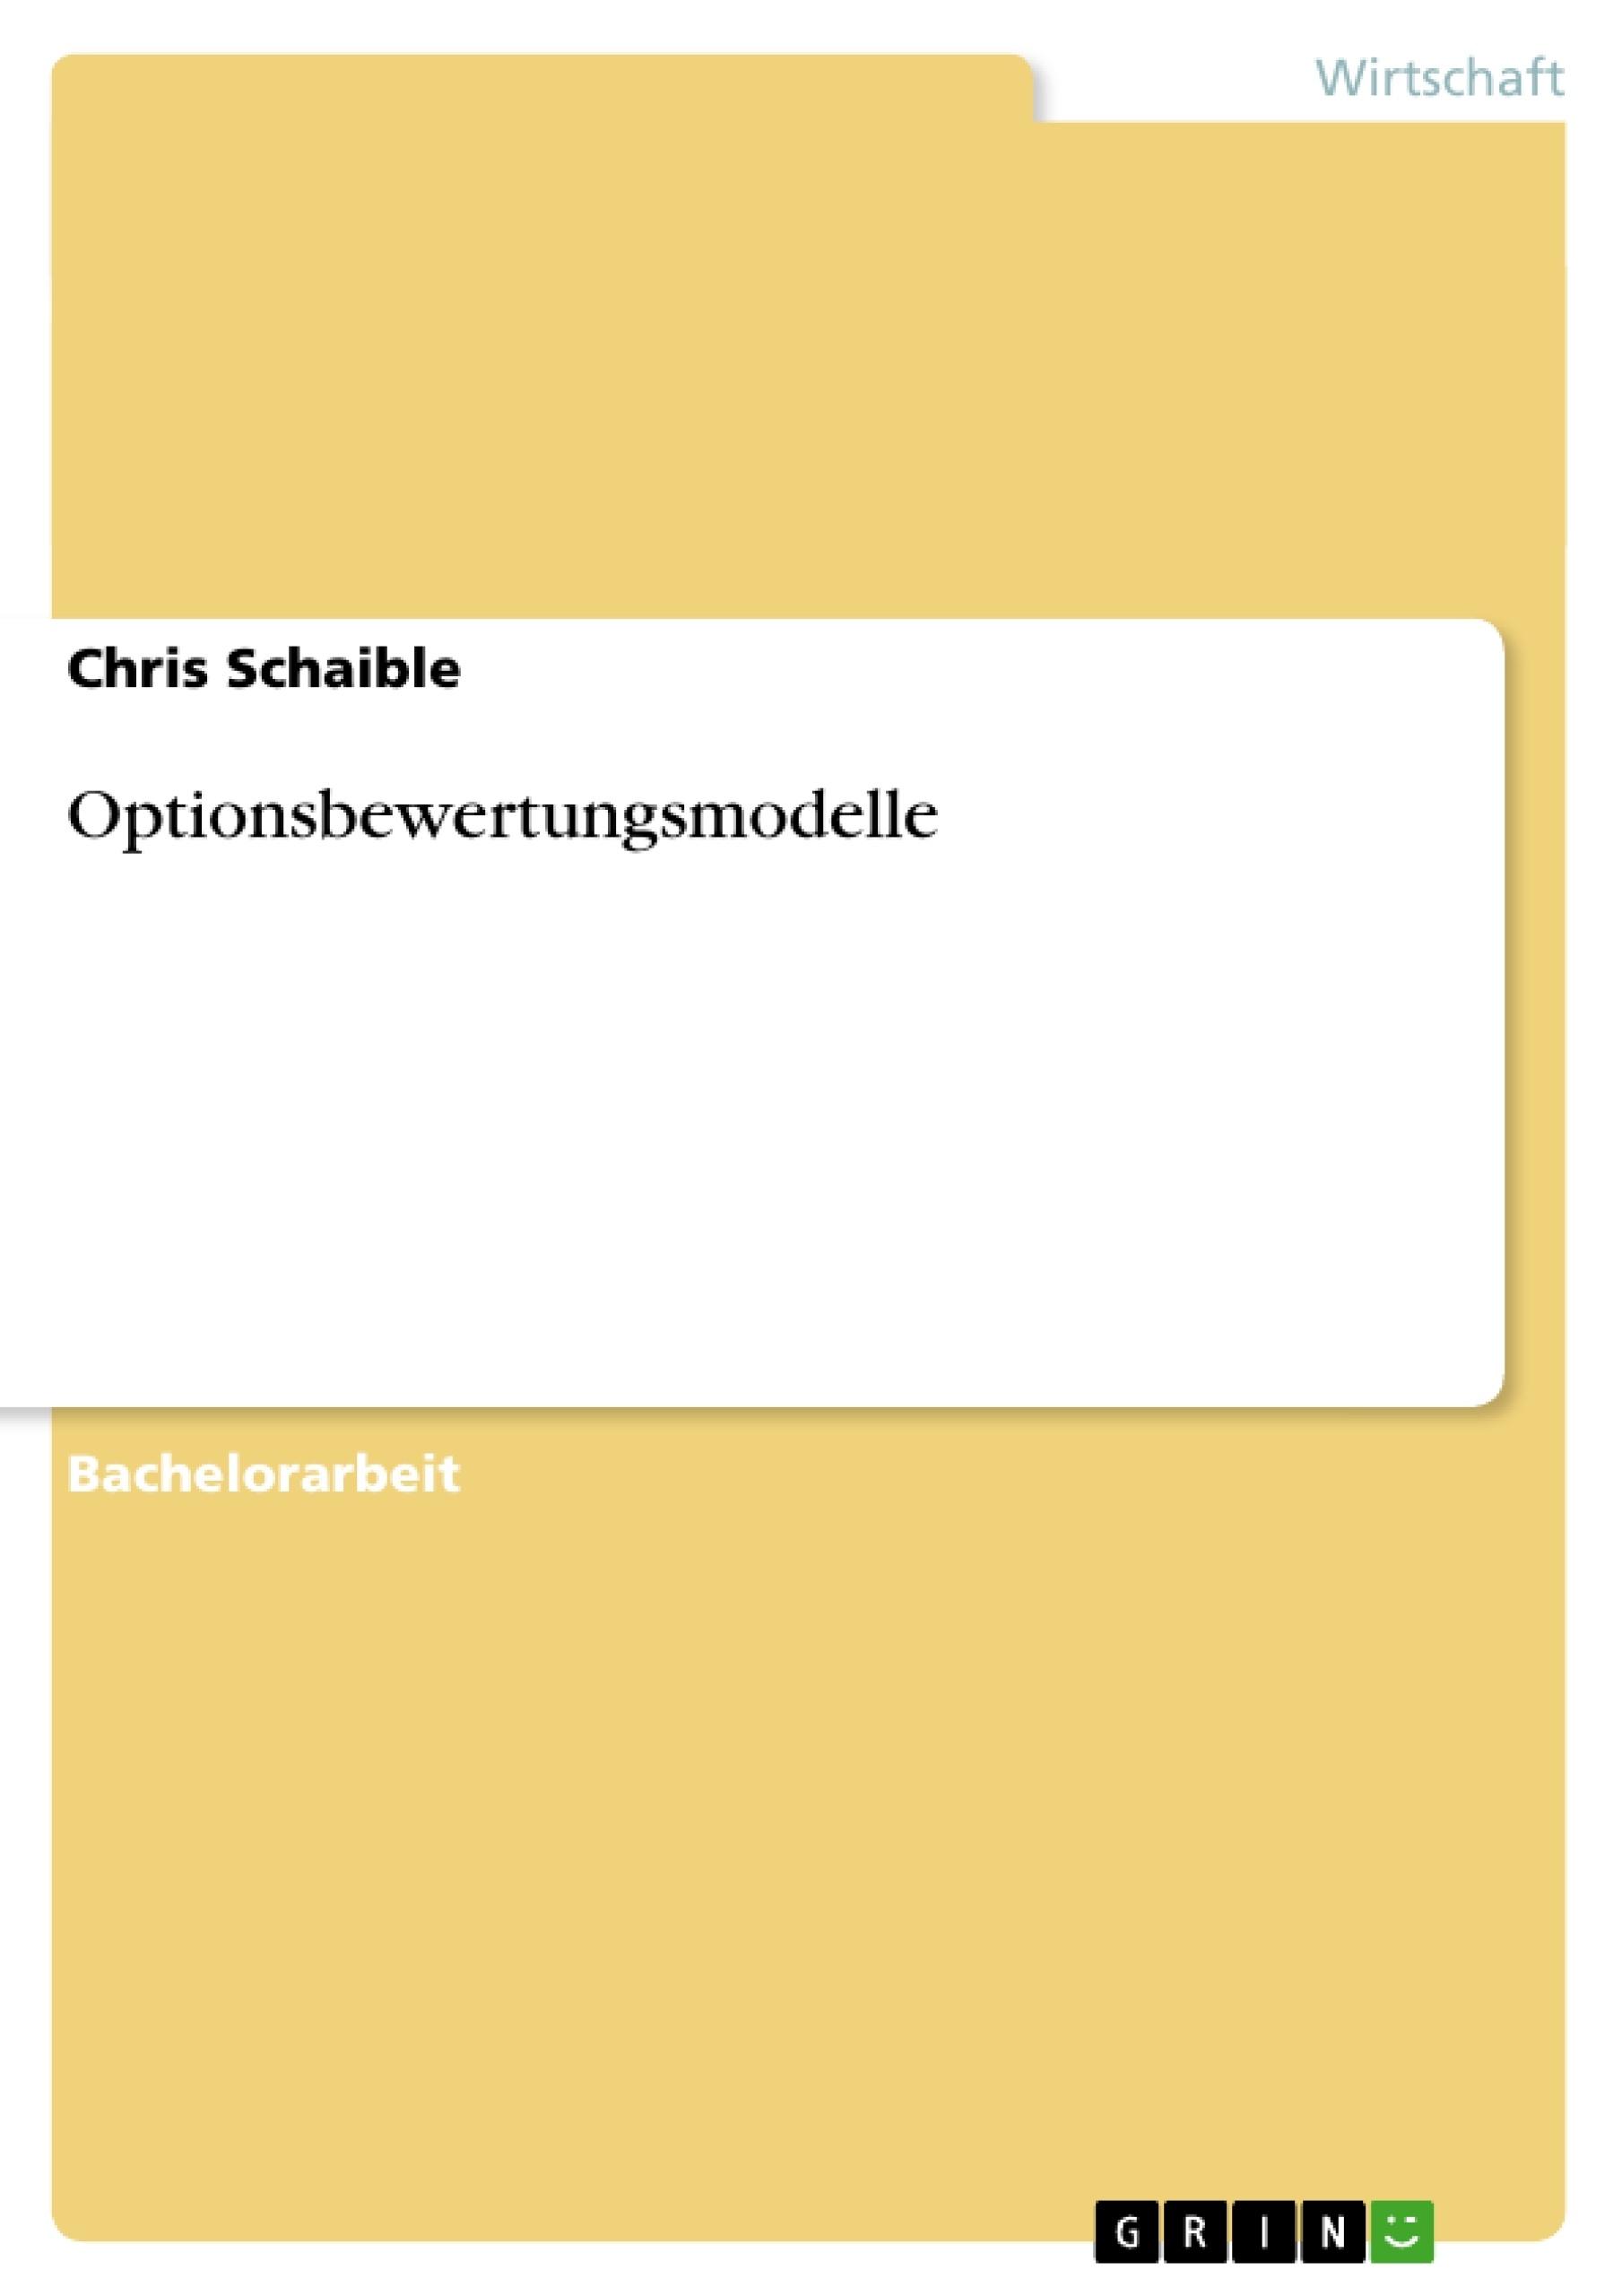 Titel: Optionsbewertungsmodelle